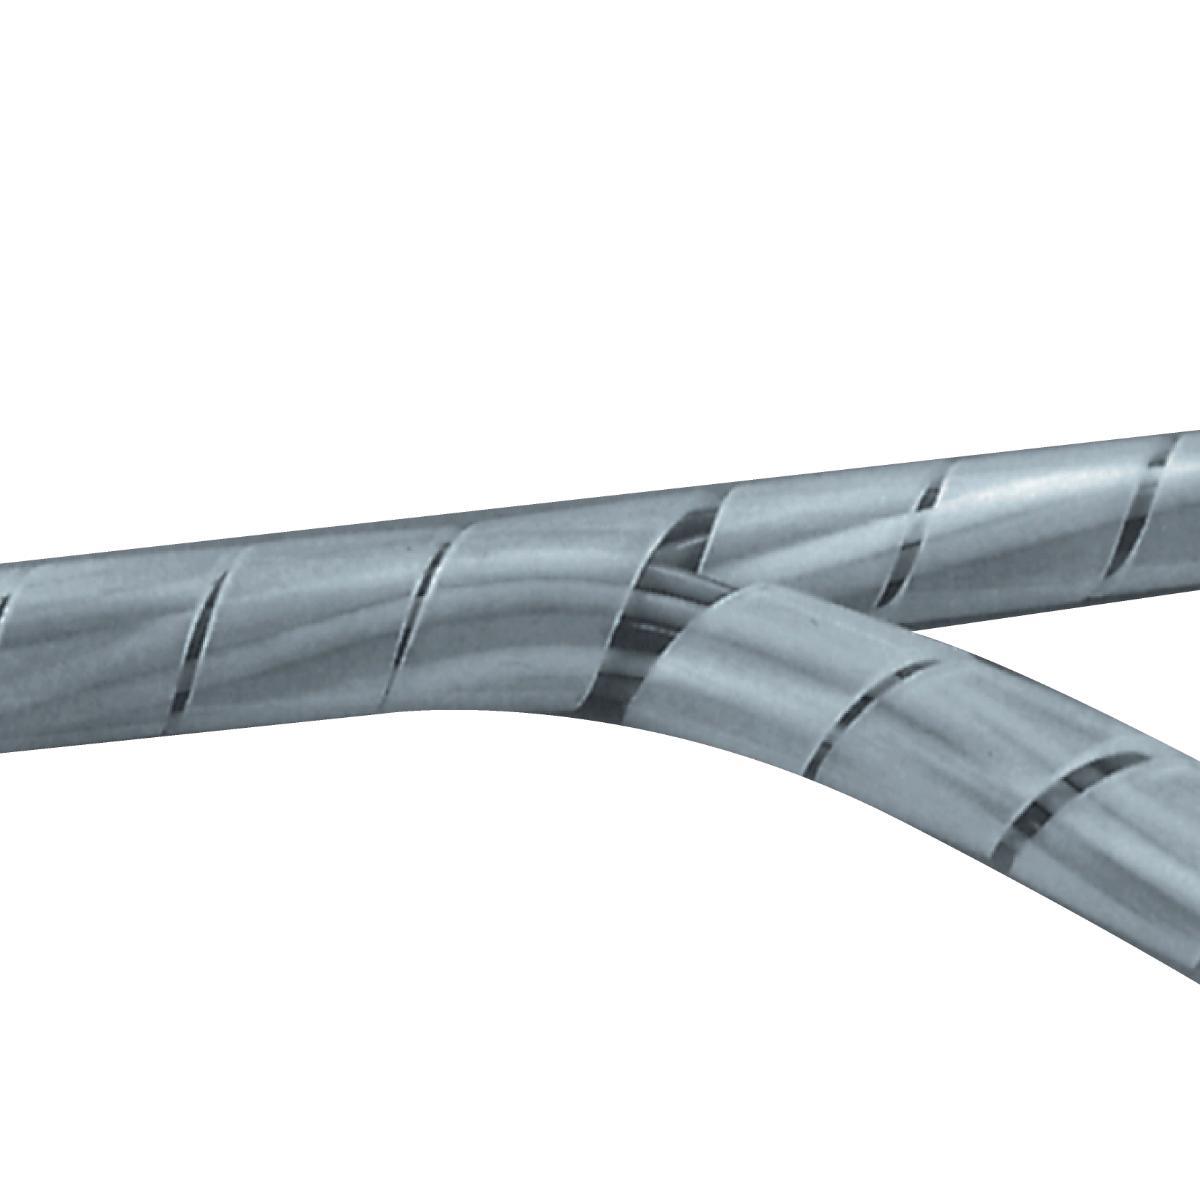 Binnen diameter 15mm - Transparant - Fixapart